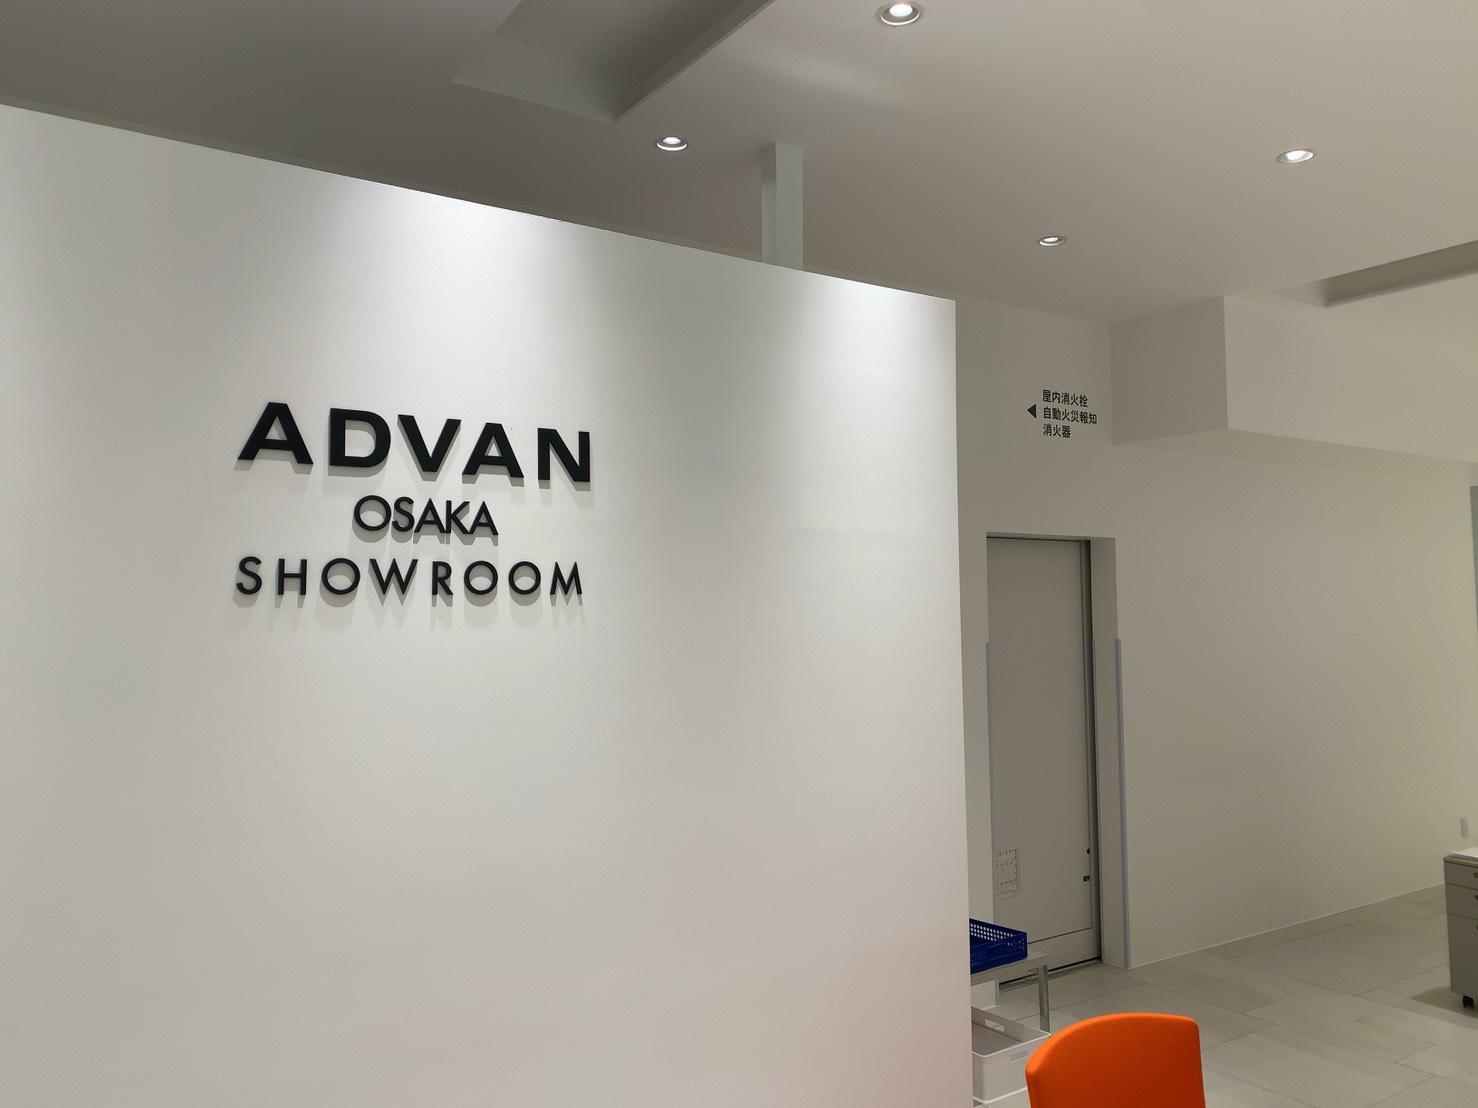 Advanのショールームへ